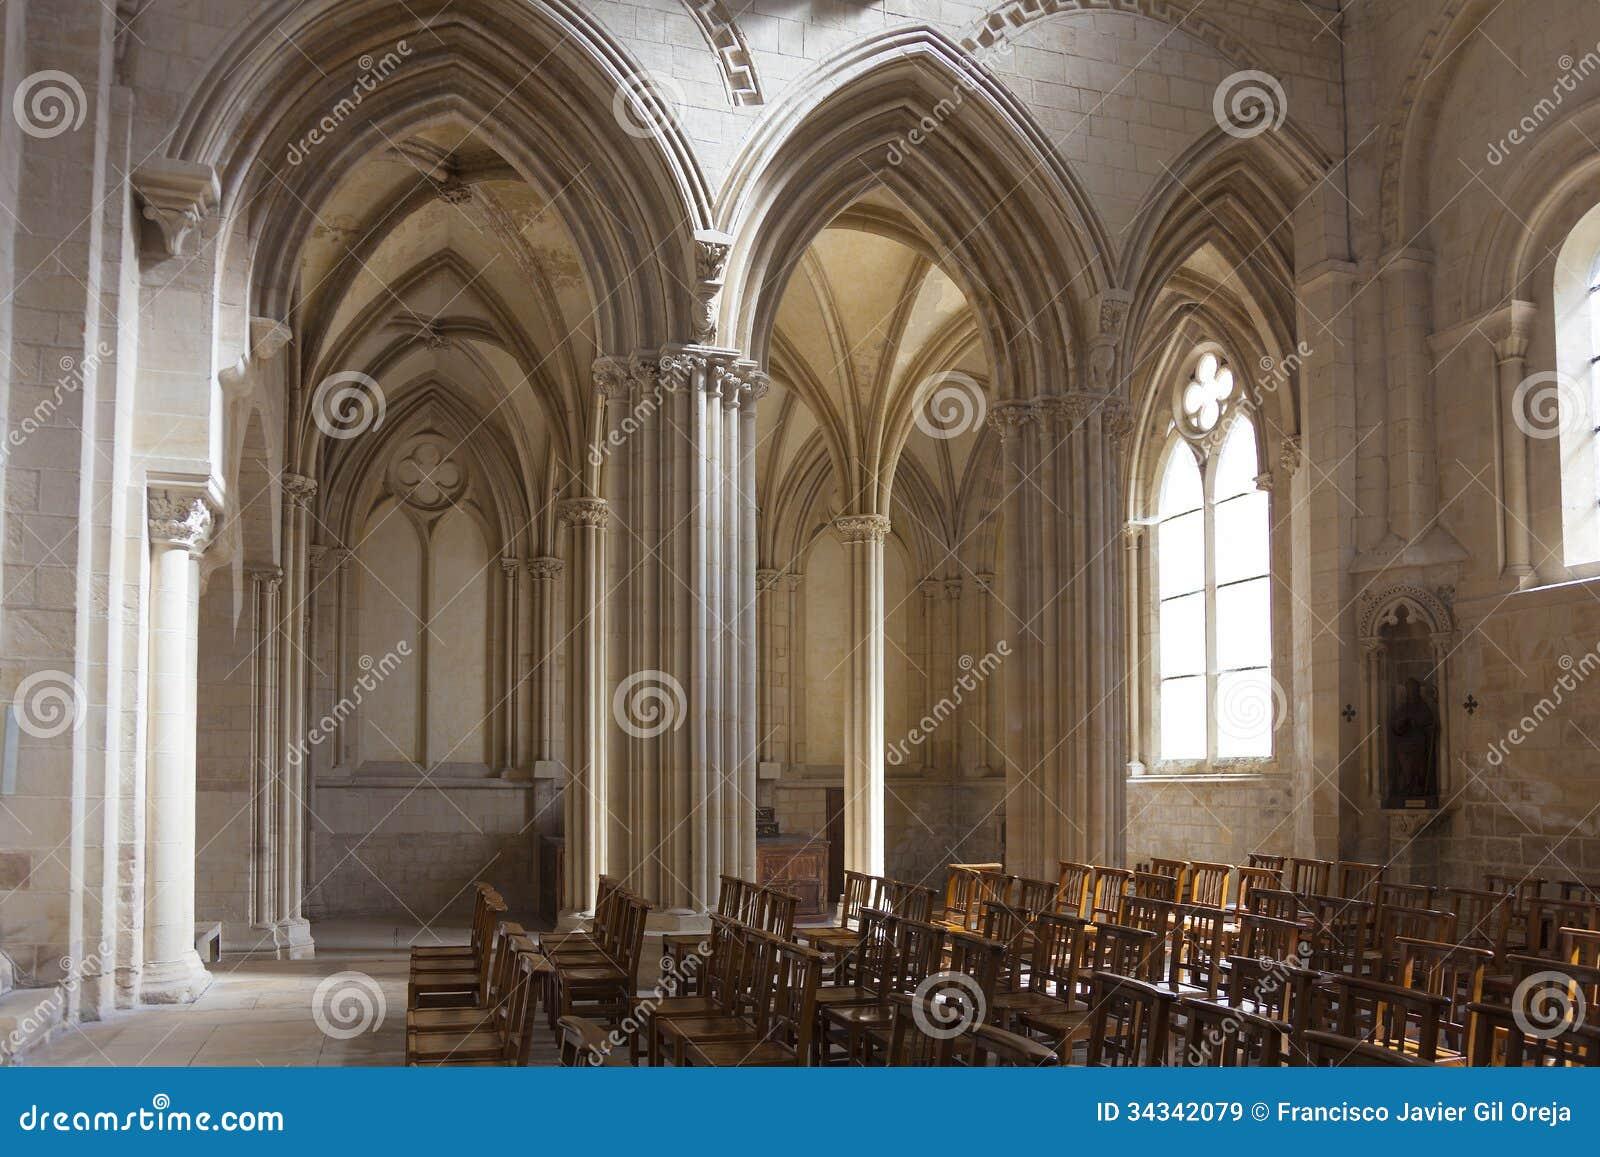 eglise de la sainte trinite abbaye aux dames caen stock image image 34342079. Black Bedroom Furniture Sets. Home Design Ideas